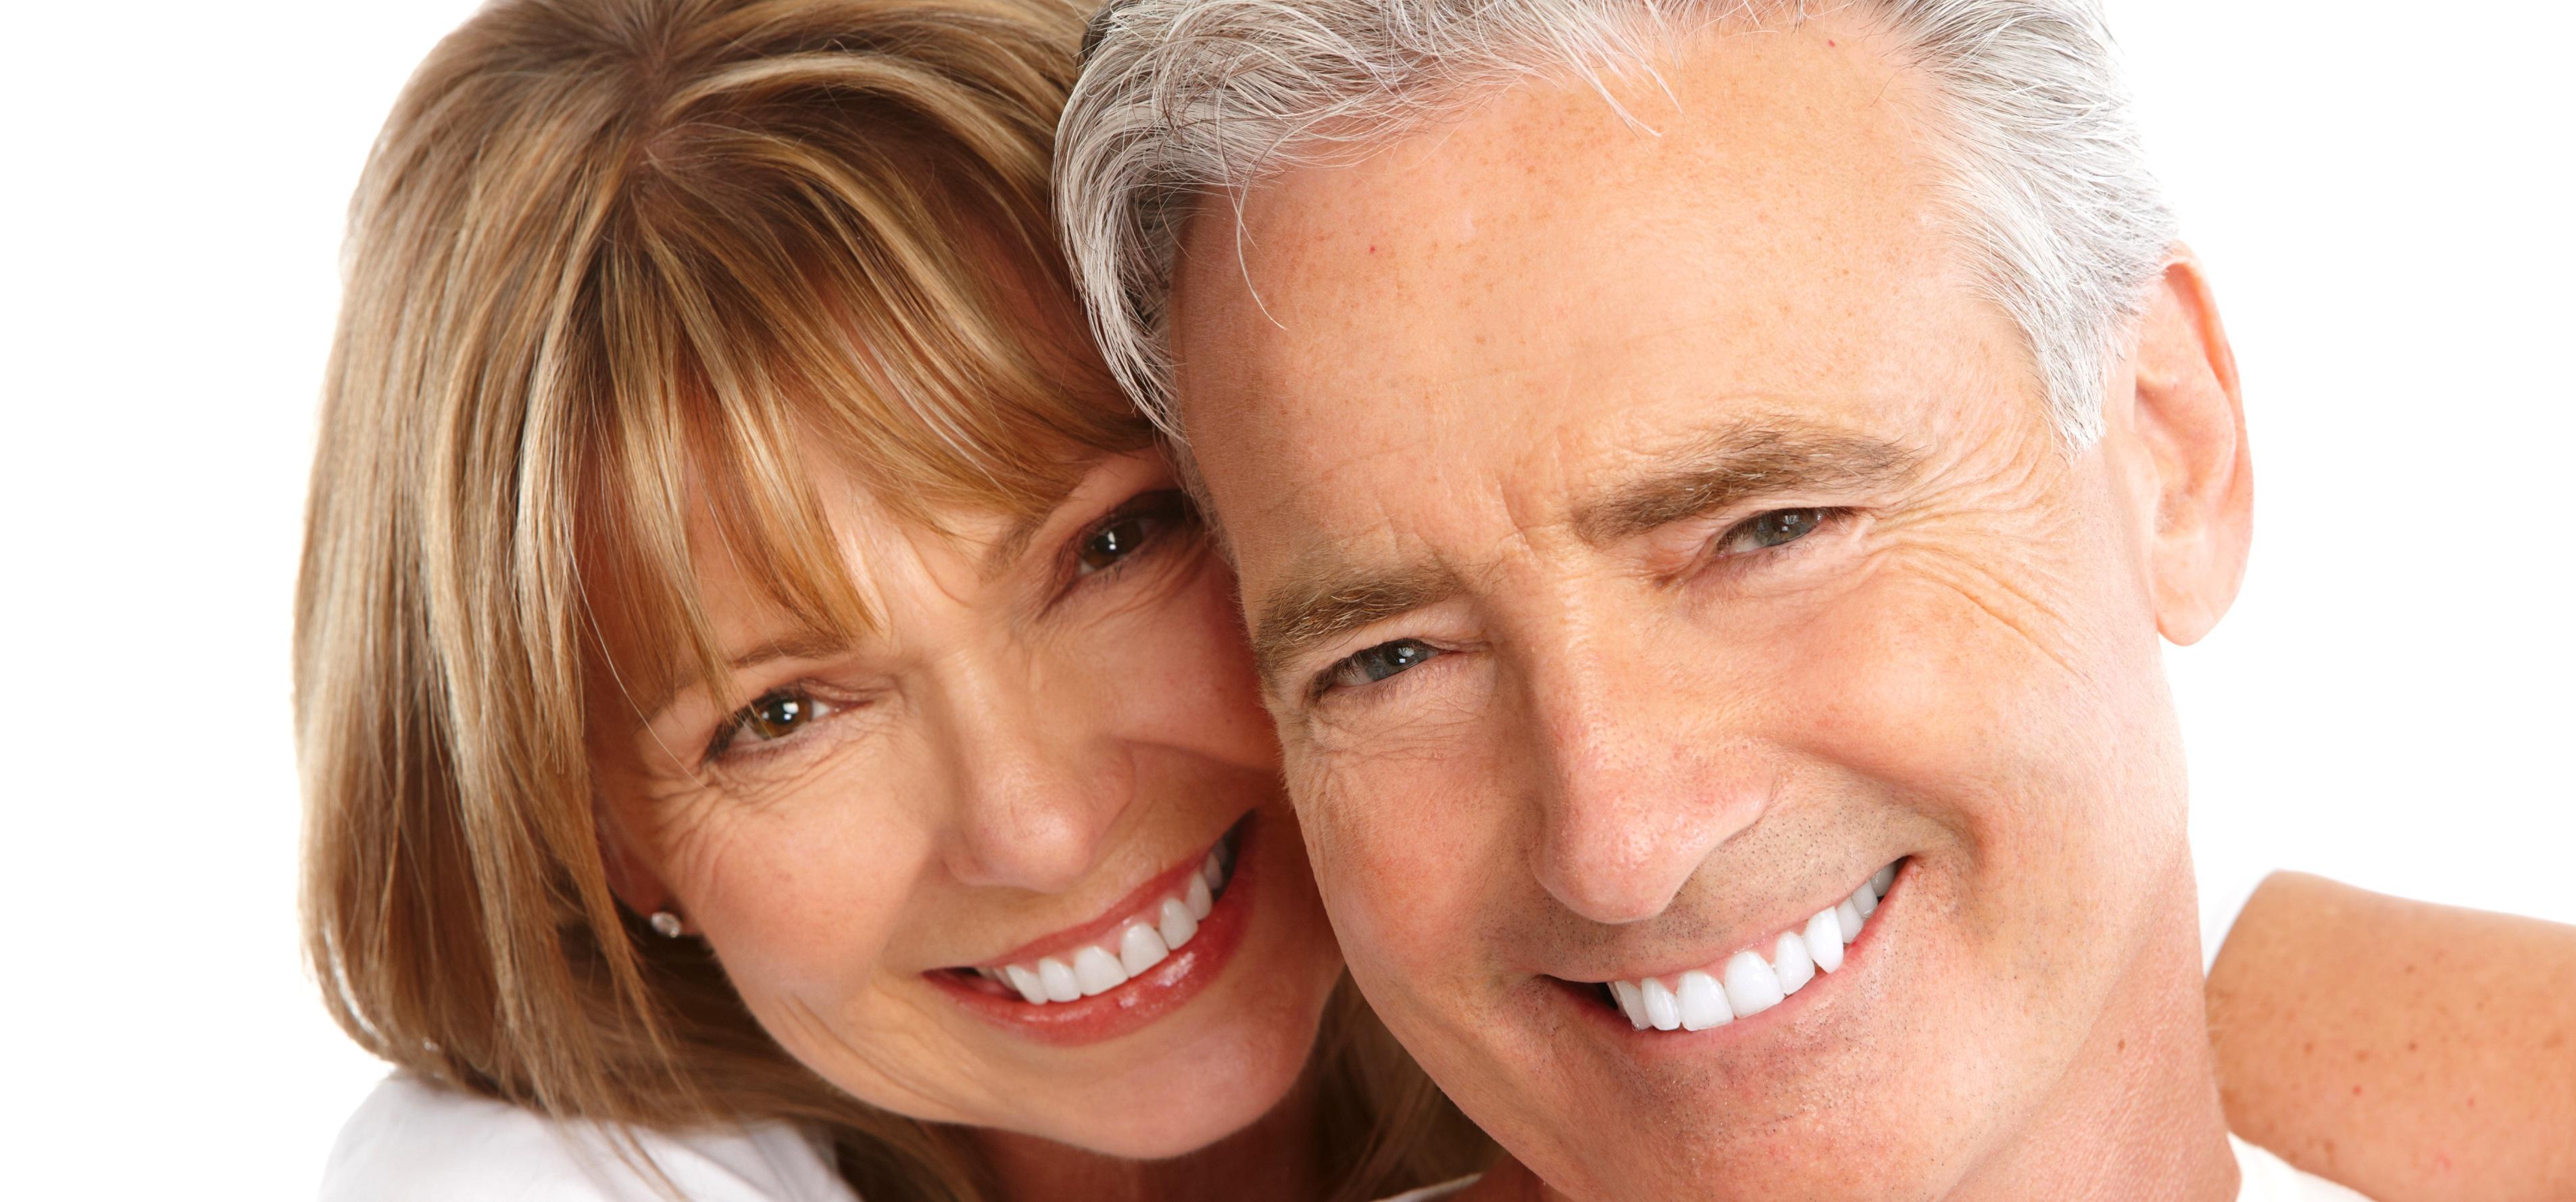 smiling-couple-horizontal